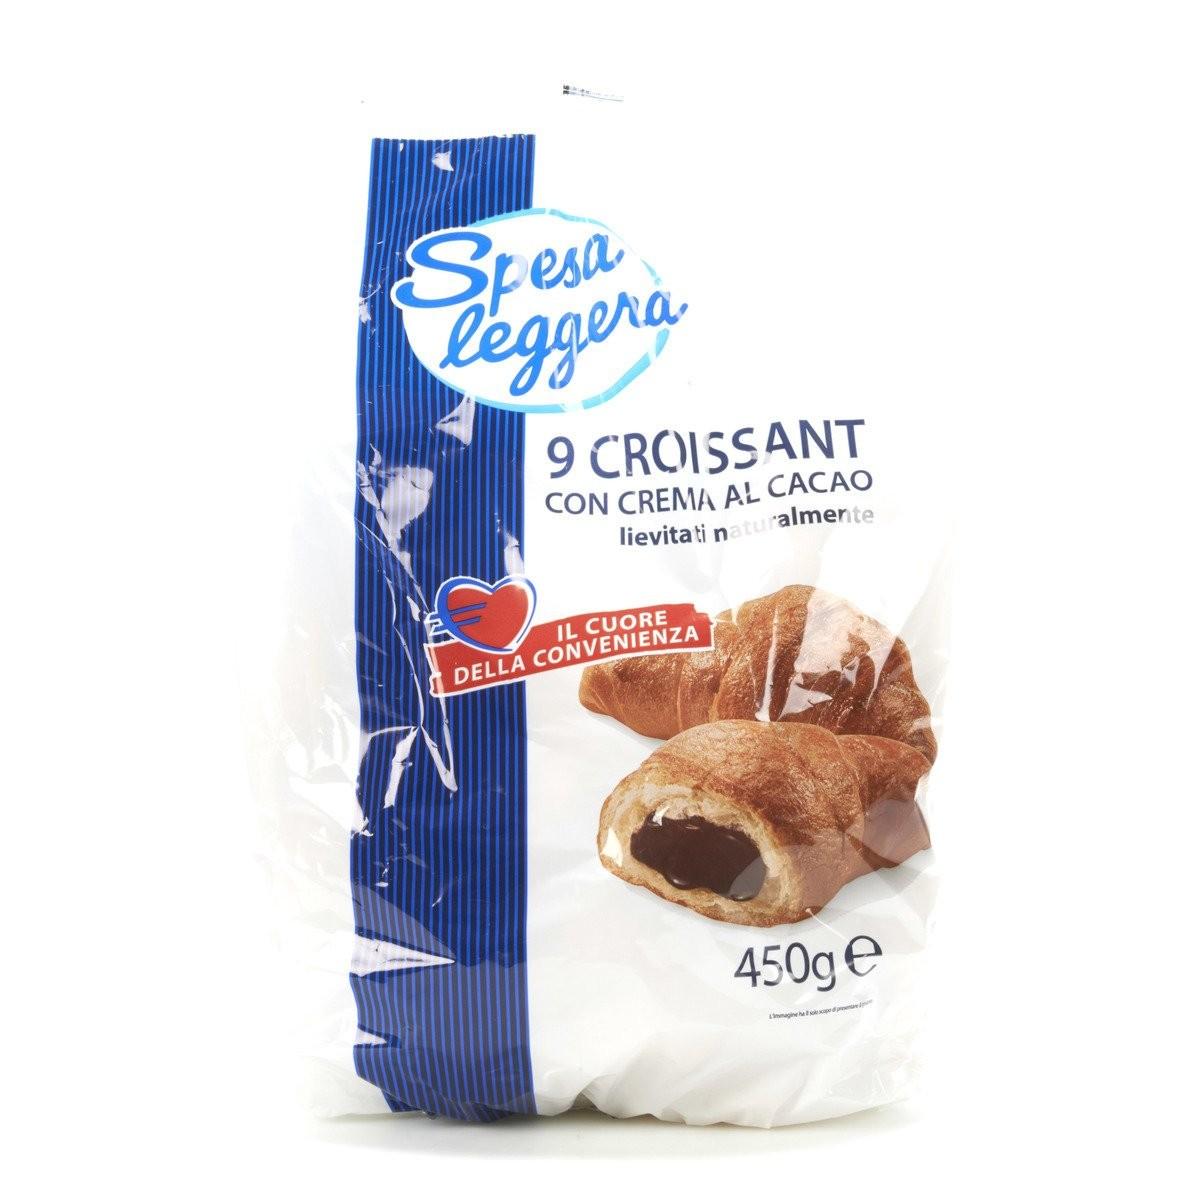 Croissant con crema al cacao